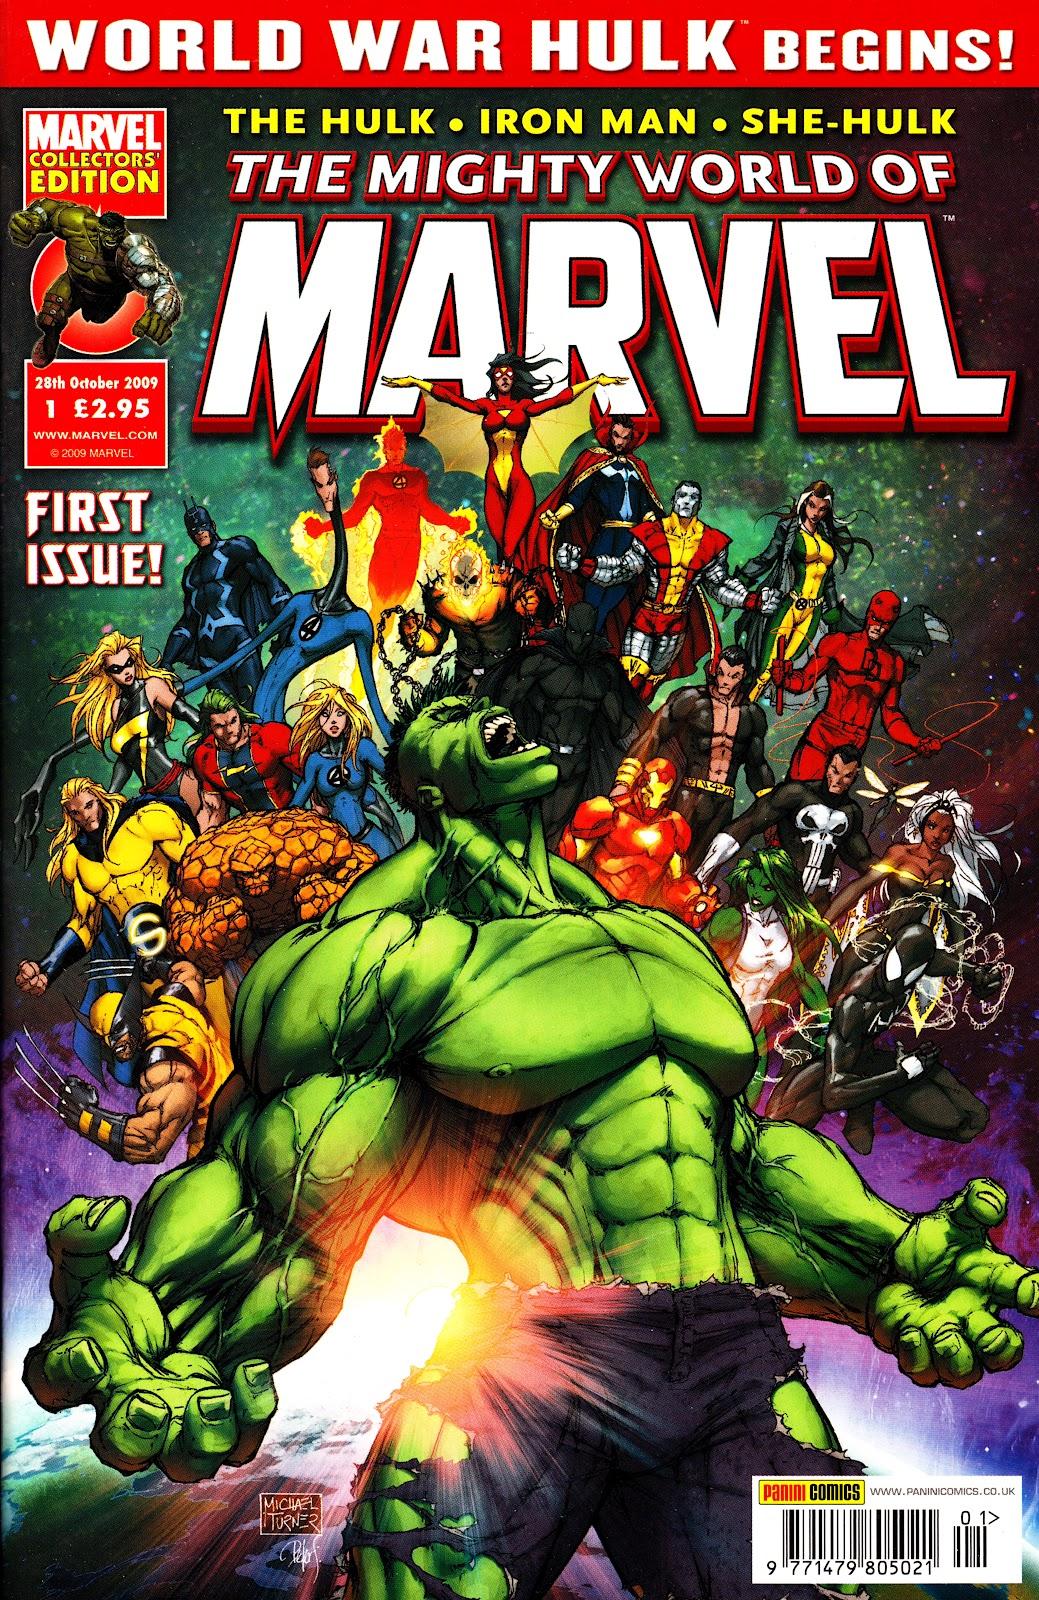 Displaying 20> Images For - Spider Hulk Transformation...